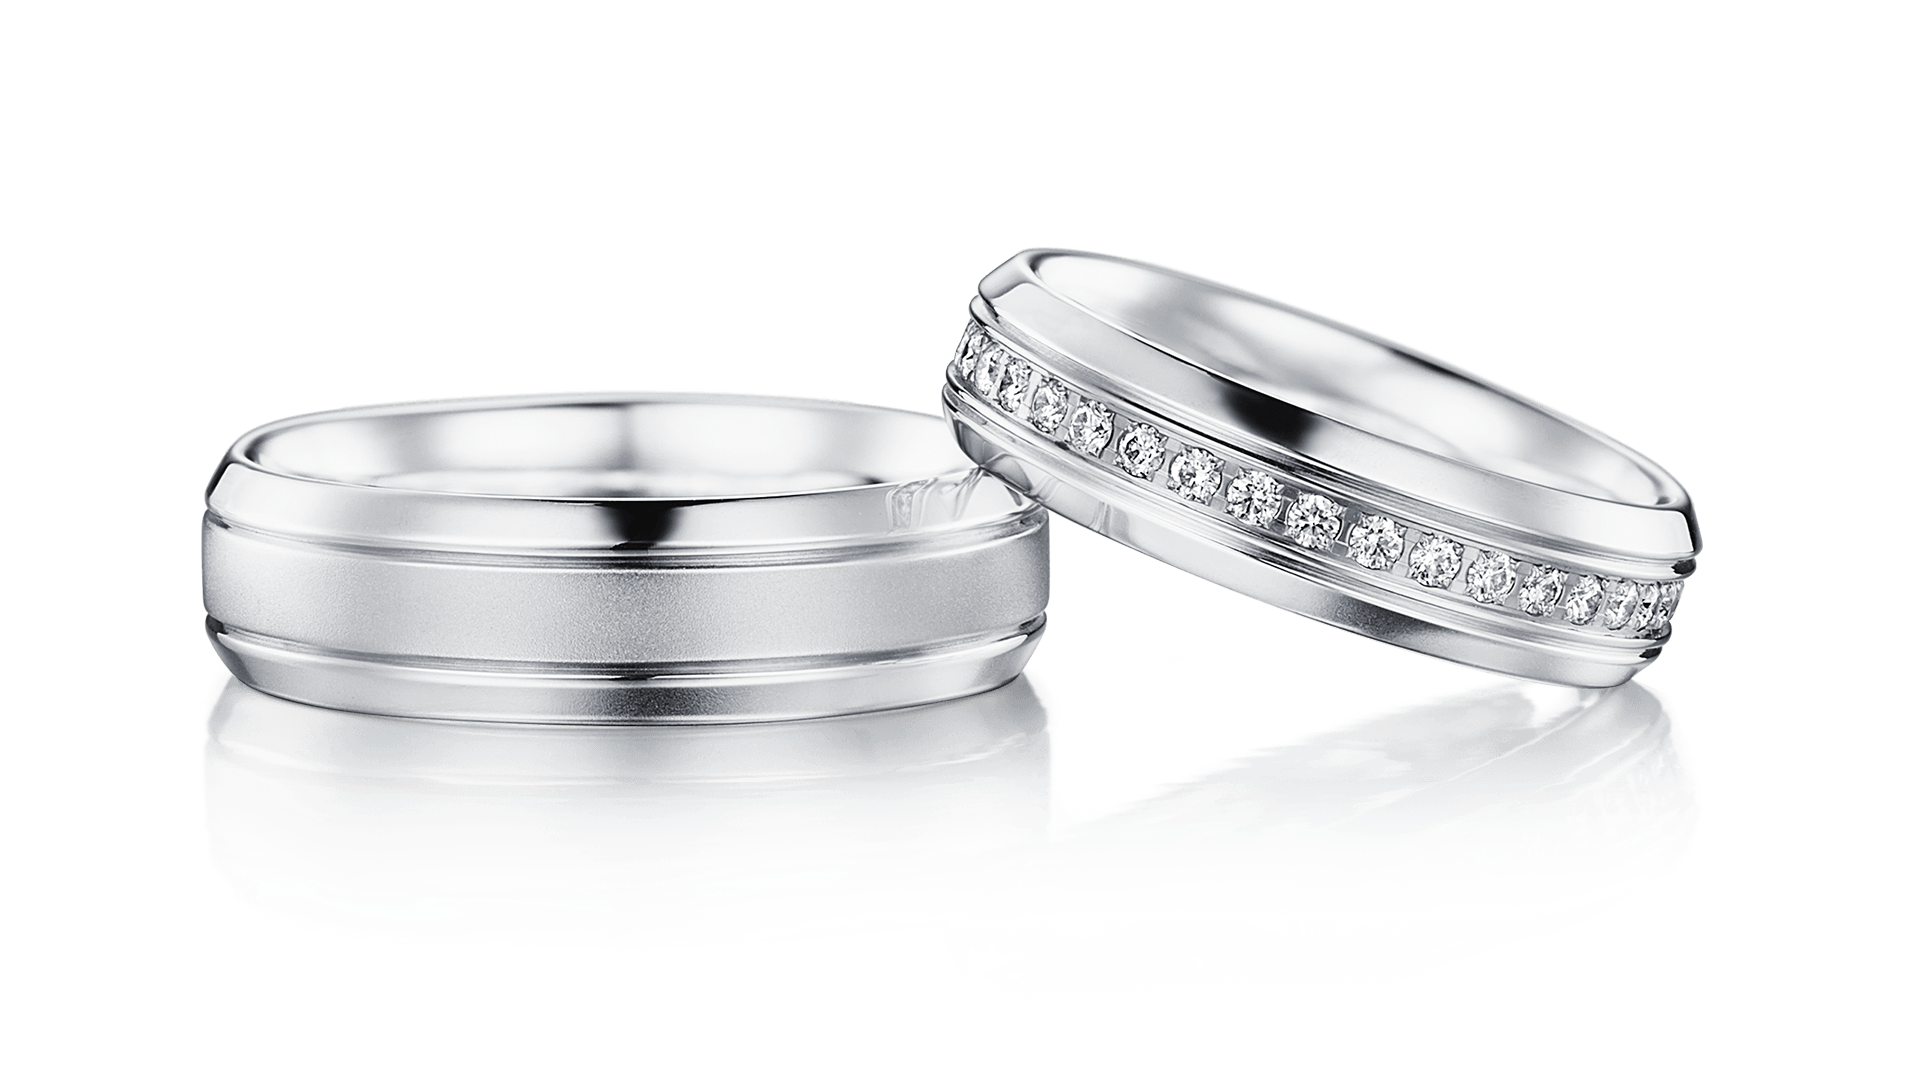 elektra エレクトラ | 結婚指輪サムネイル 1